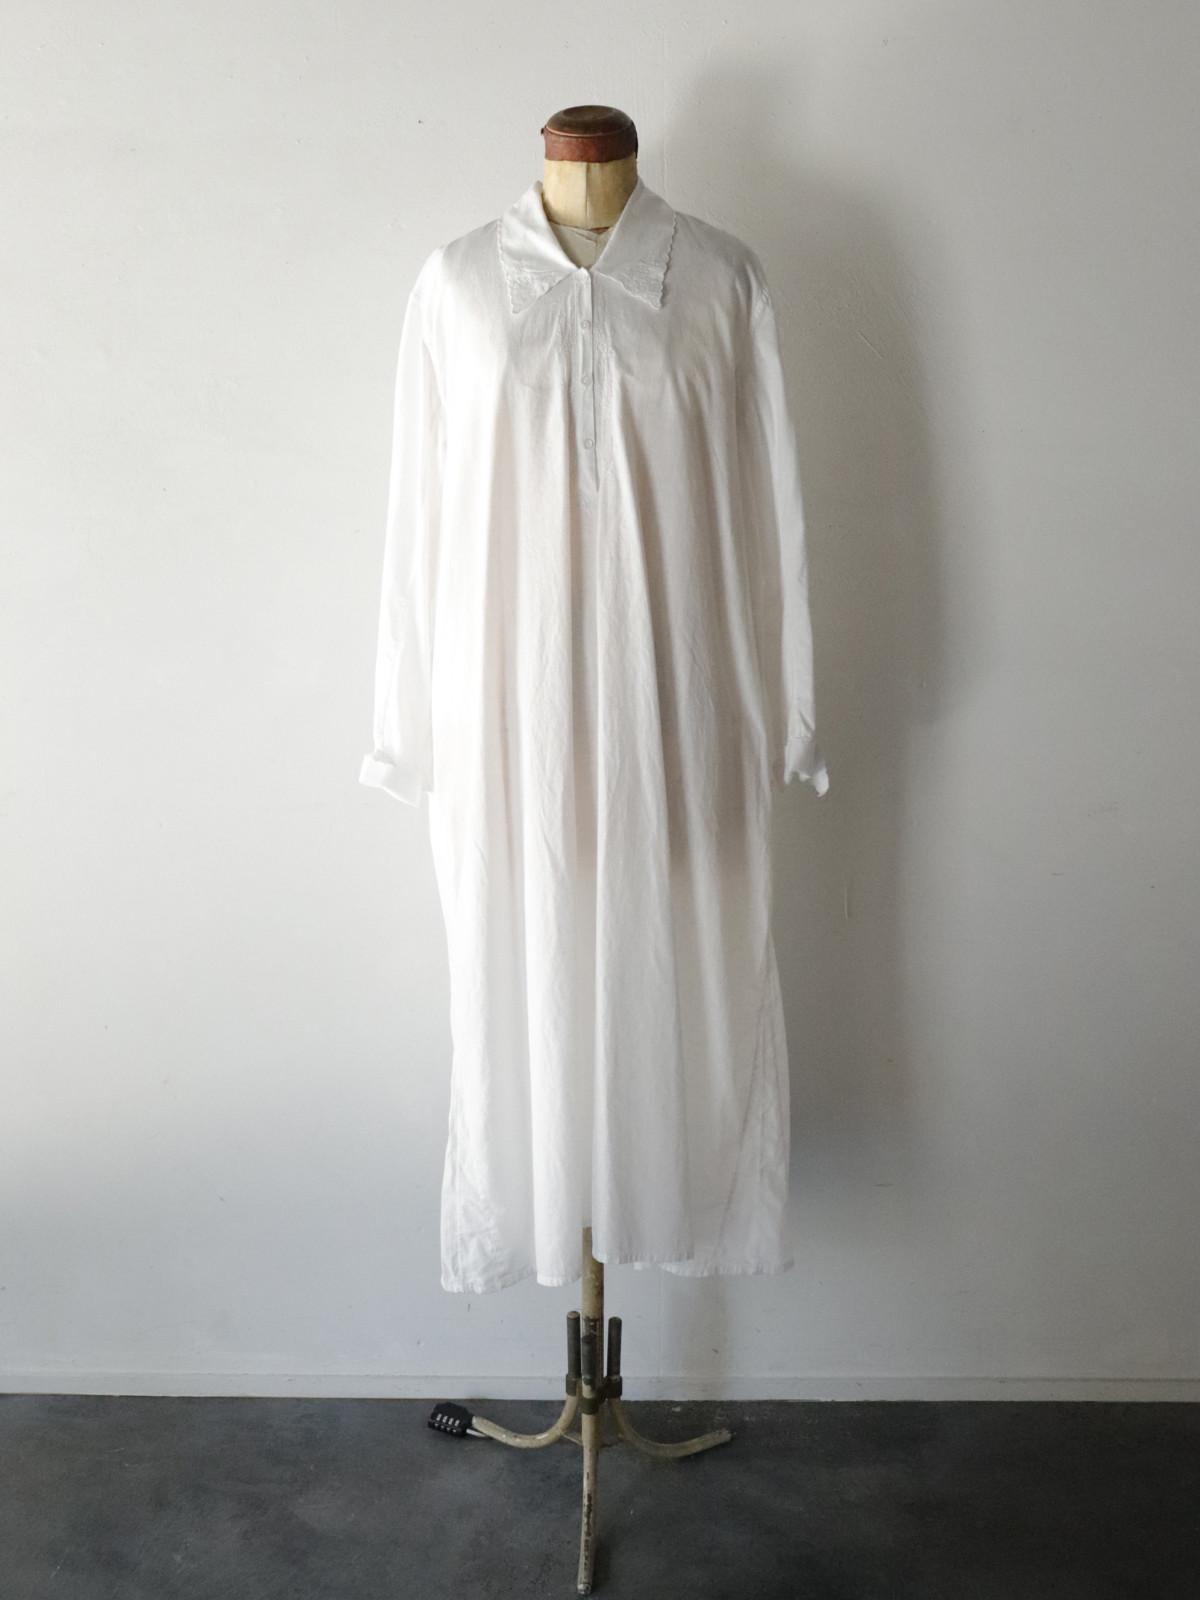 vintage,europe,linen,cotton,nightwear,lace,enbroidery,onepiece